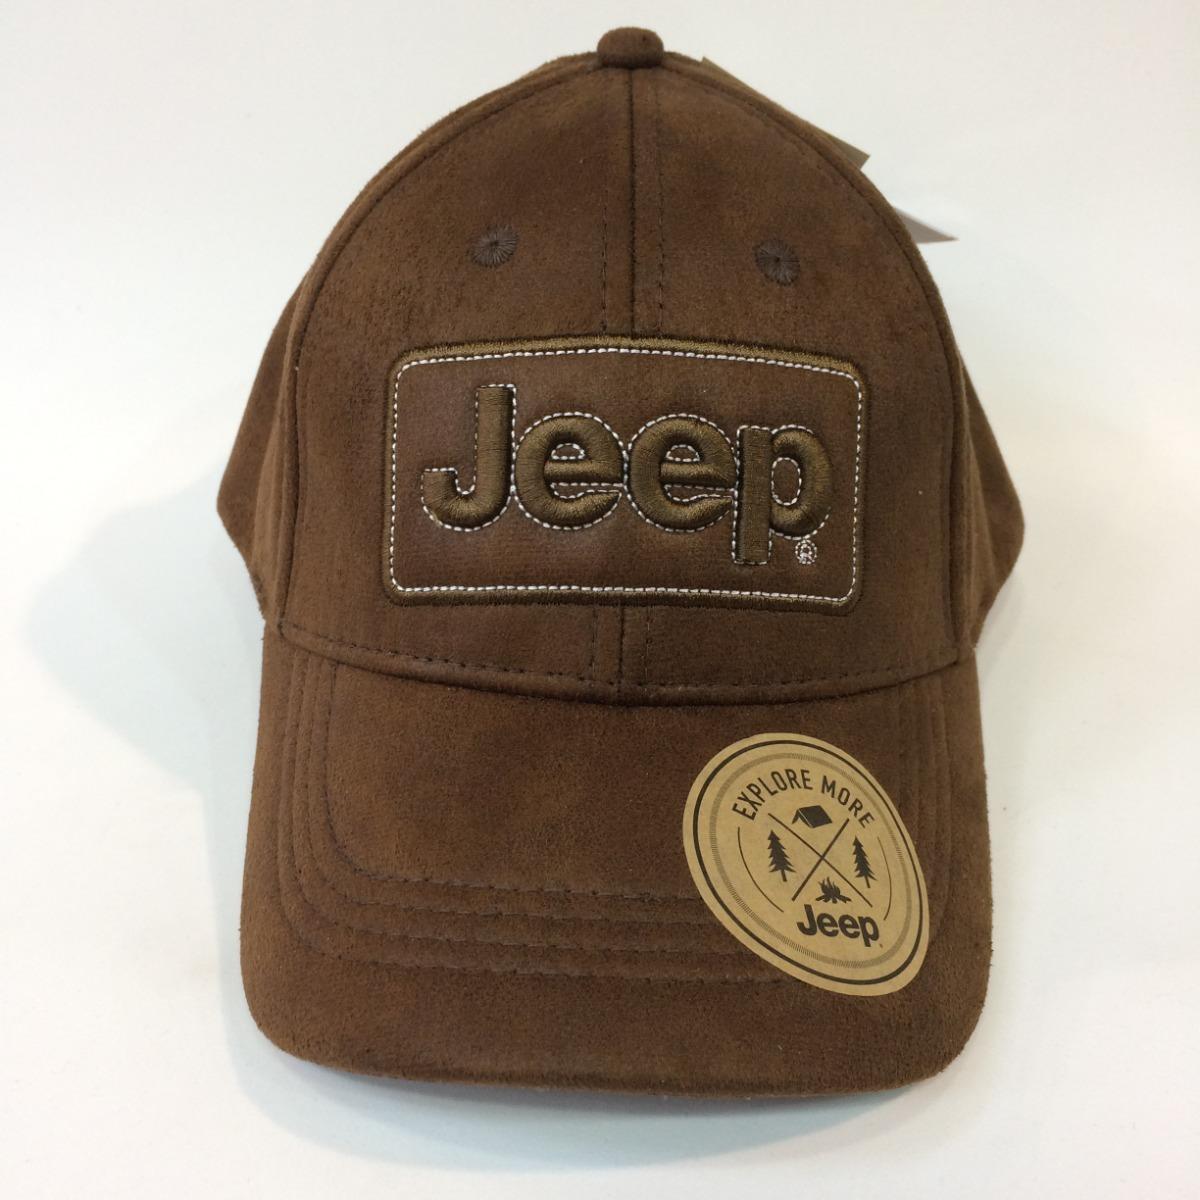 6b1bf009162fb Gorra Jeep 100% Original - Hombres - Jpa180269 - Brown - Bs. 120.000 ...